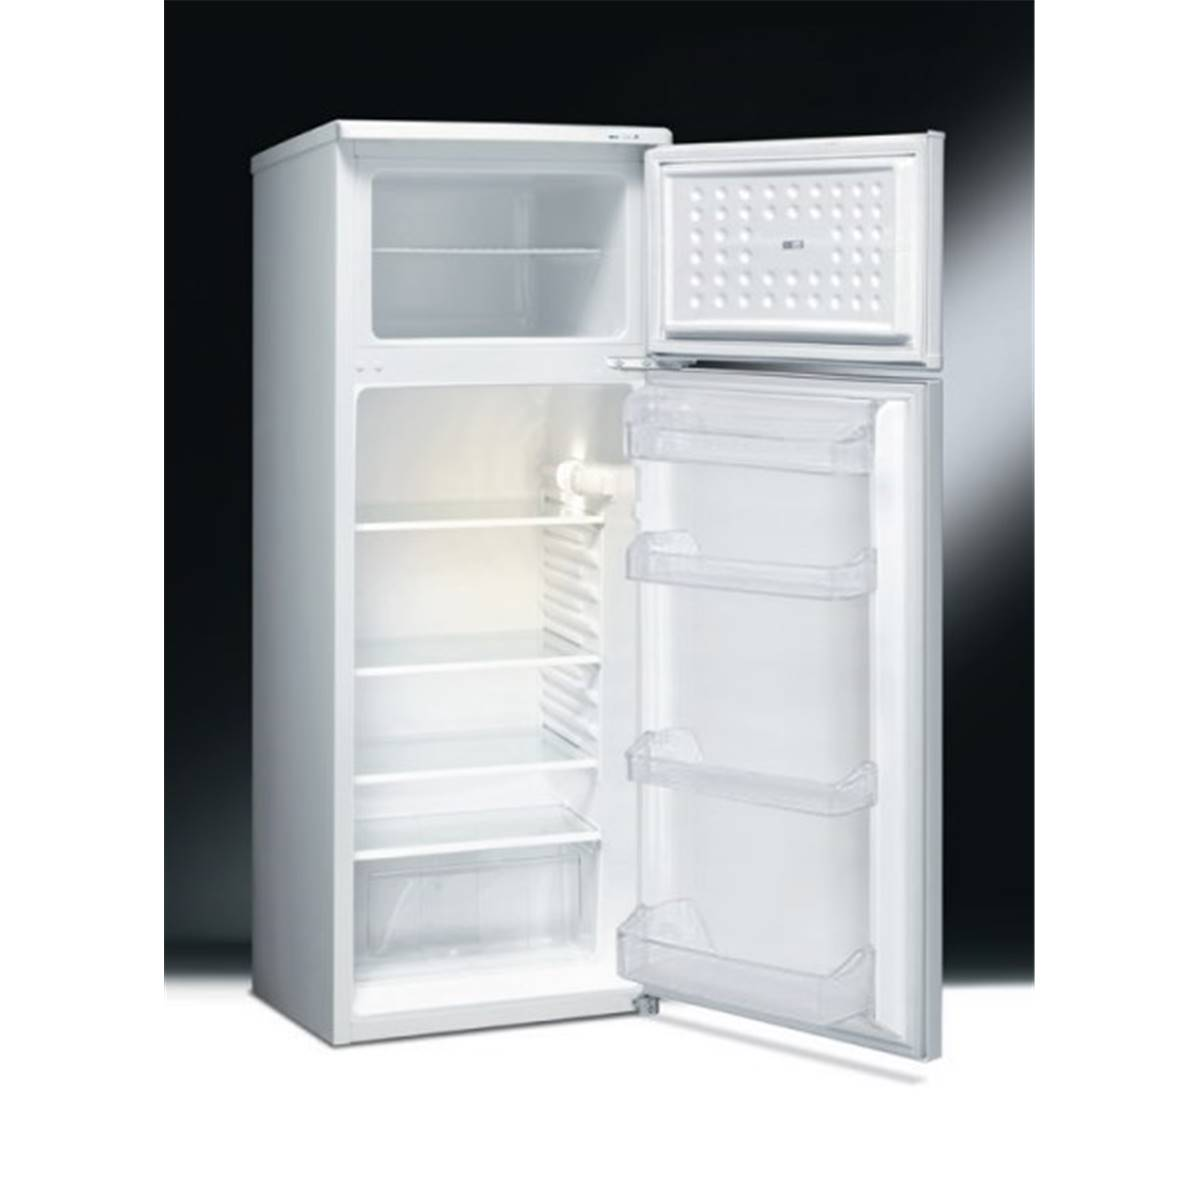 refrigerateur 2 portes smeg fd238apfx1. Black Bedroom Furniture Sets. Home Design Ideas